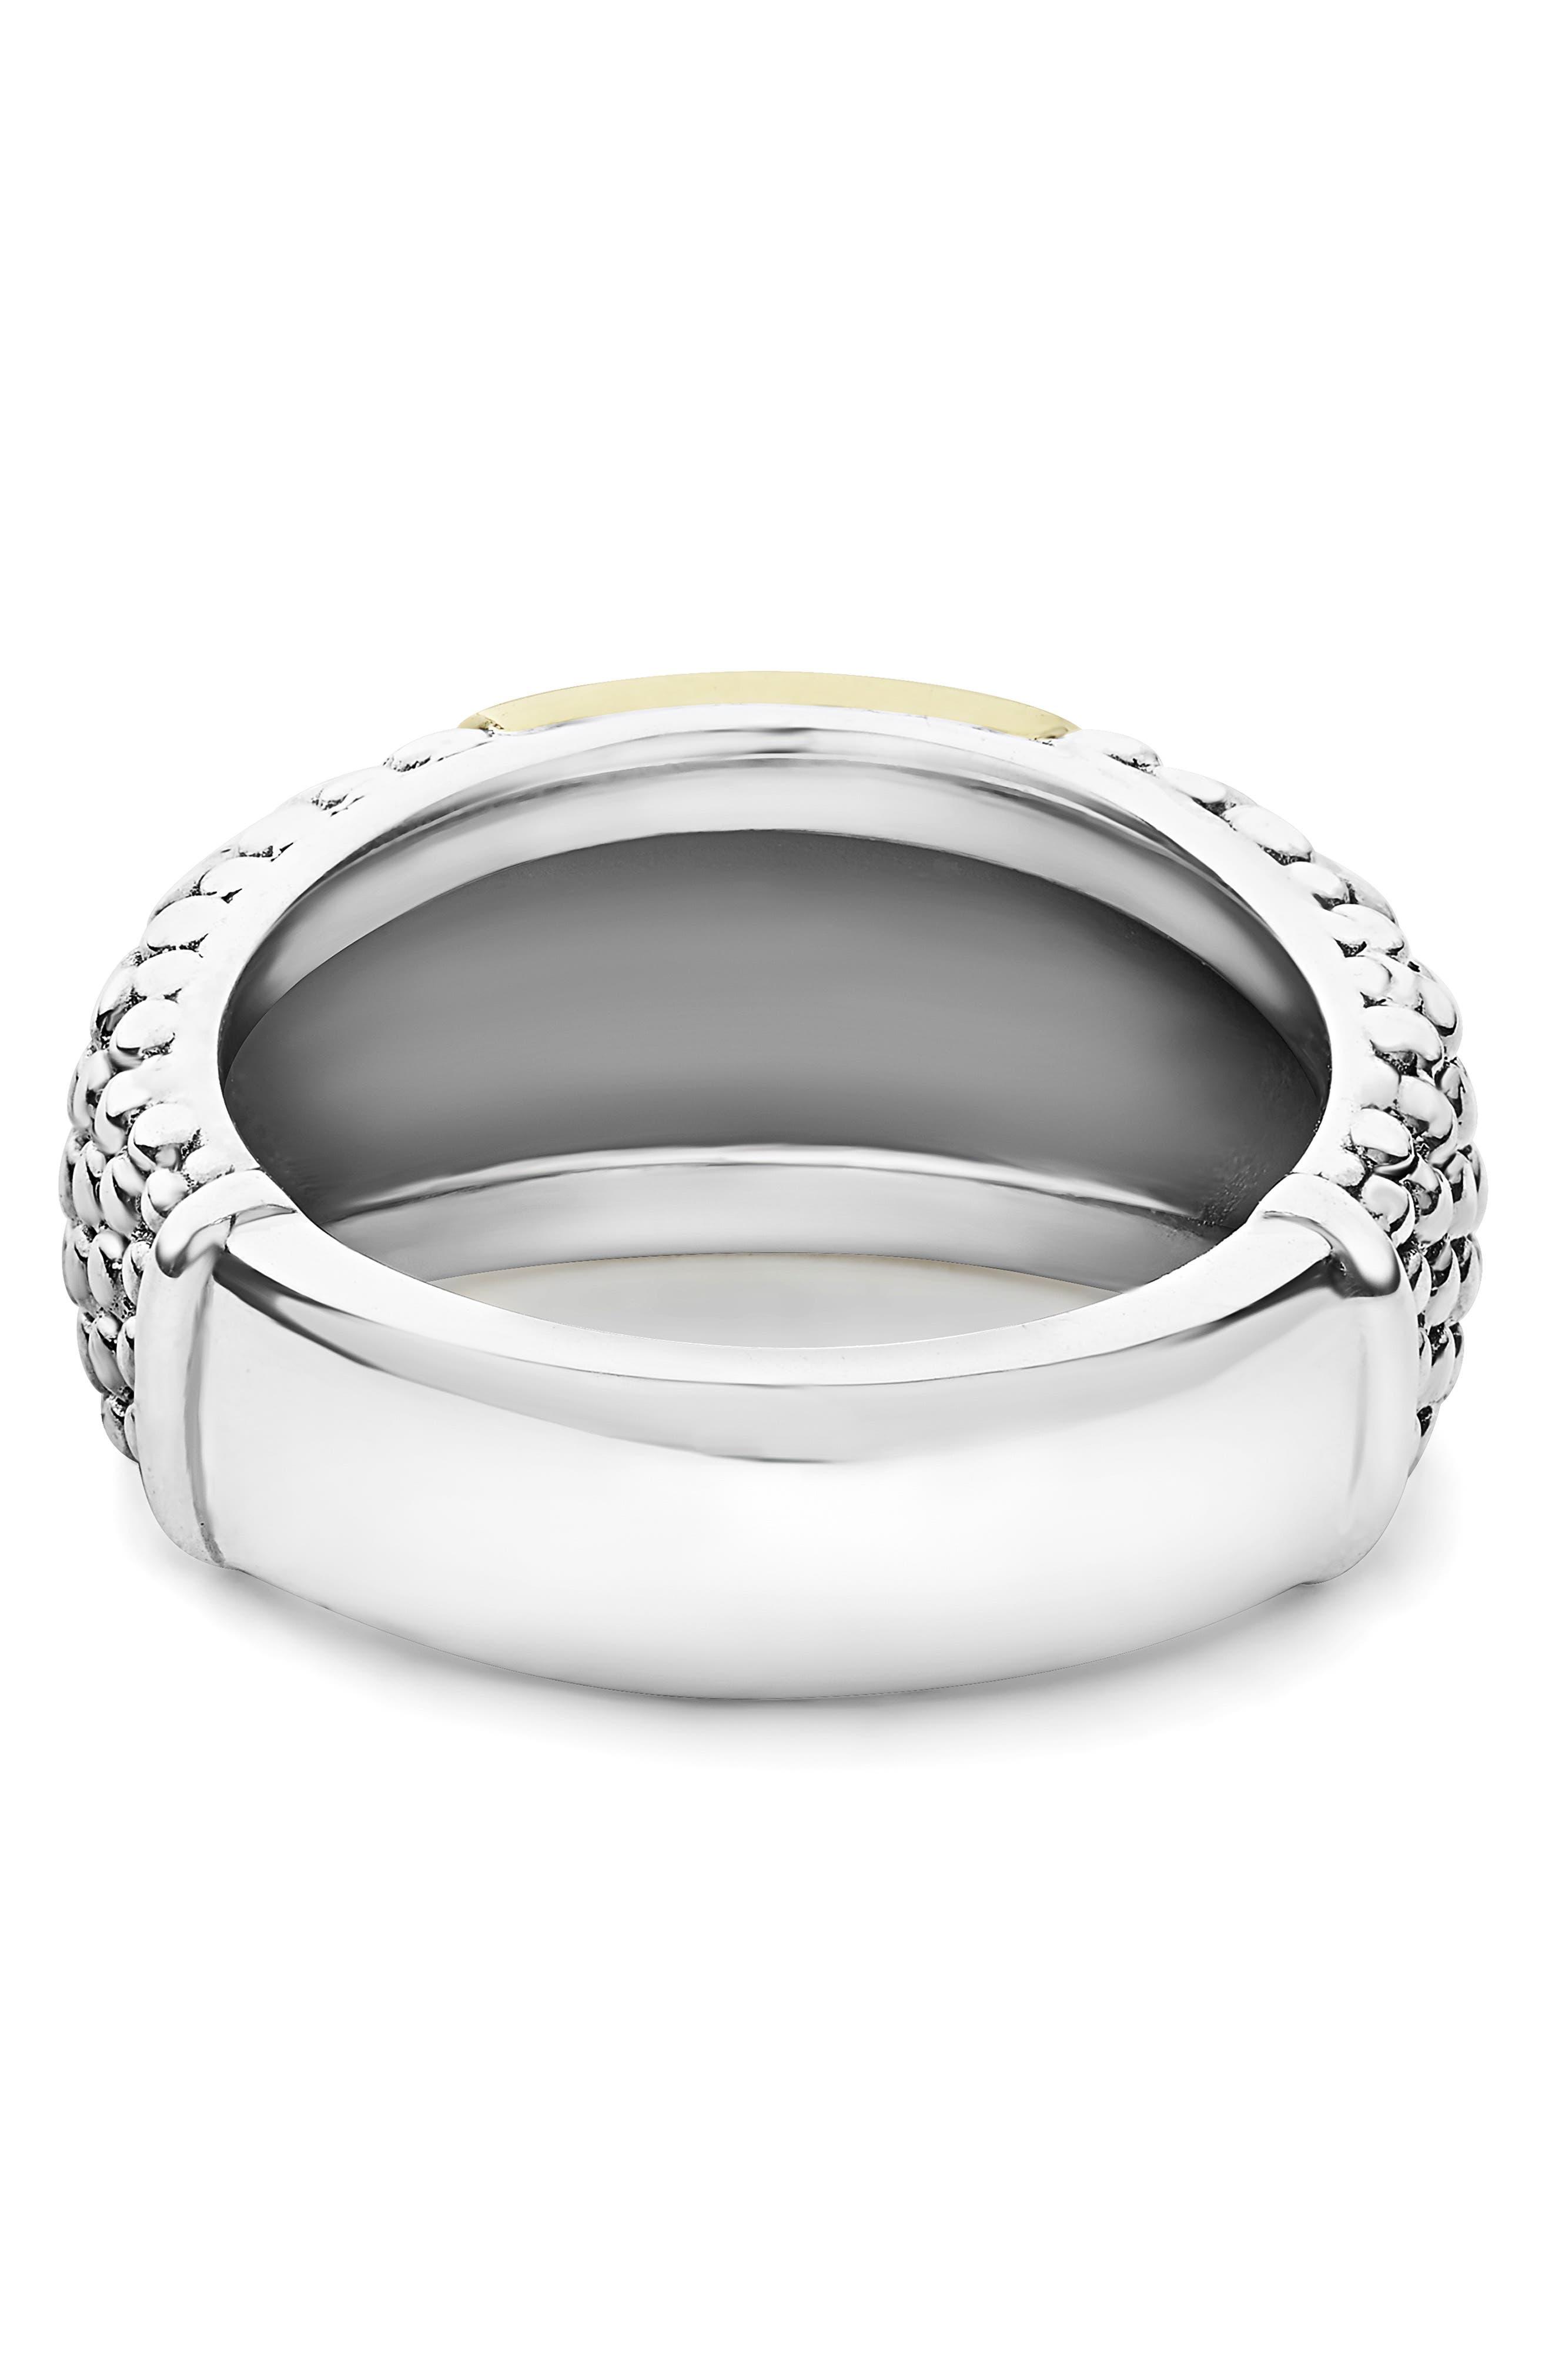 Signature Caviar High Bar Ring,                             Alternate thumbnail 4, color,                             SILVER/ GOLD